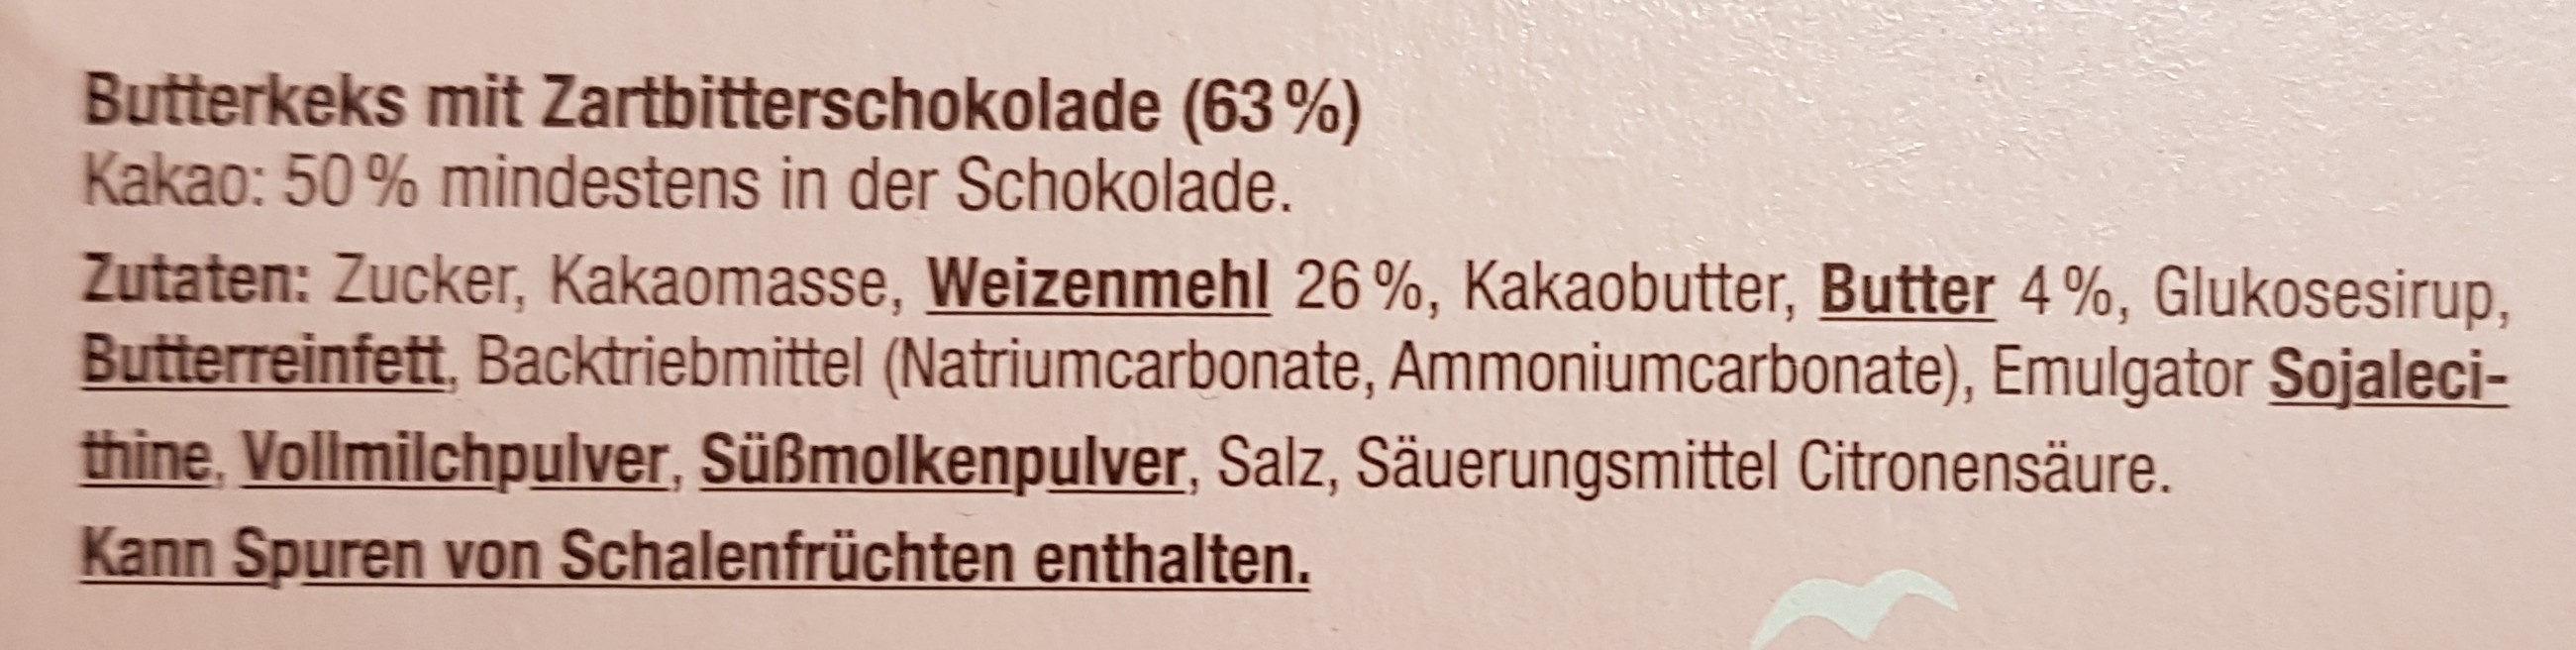 Butterkeks mit Zartbitterschokolade - Inhaltsstoffe - de